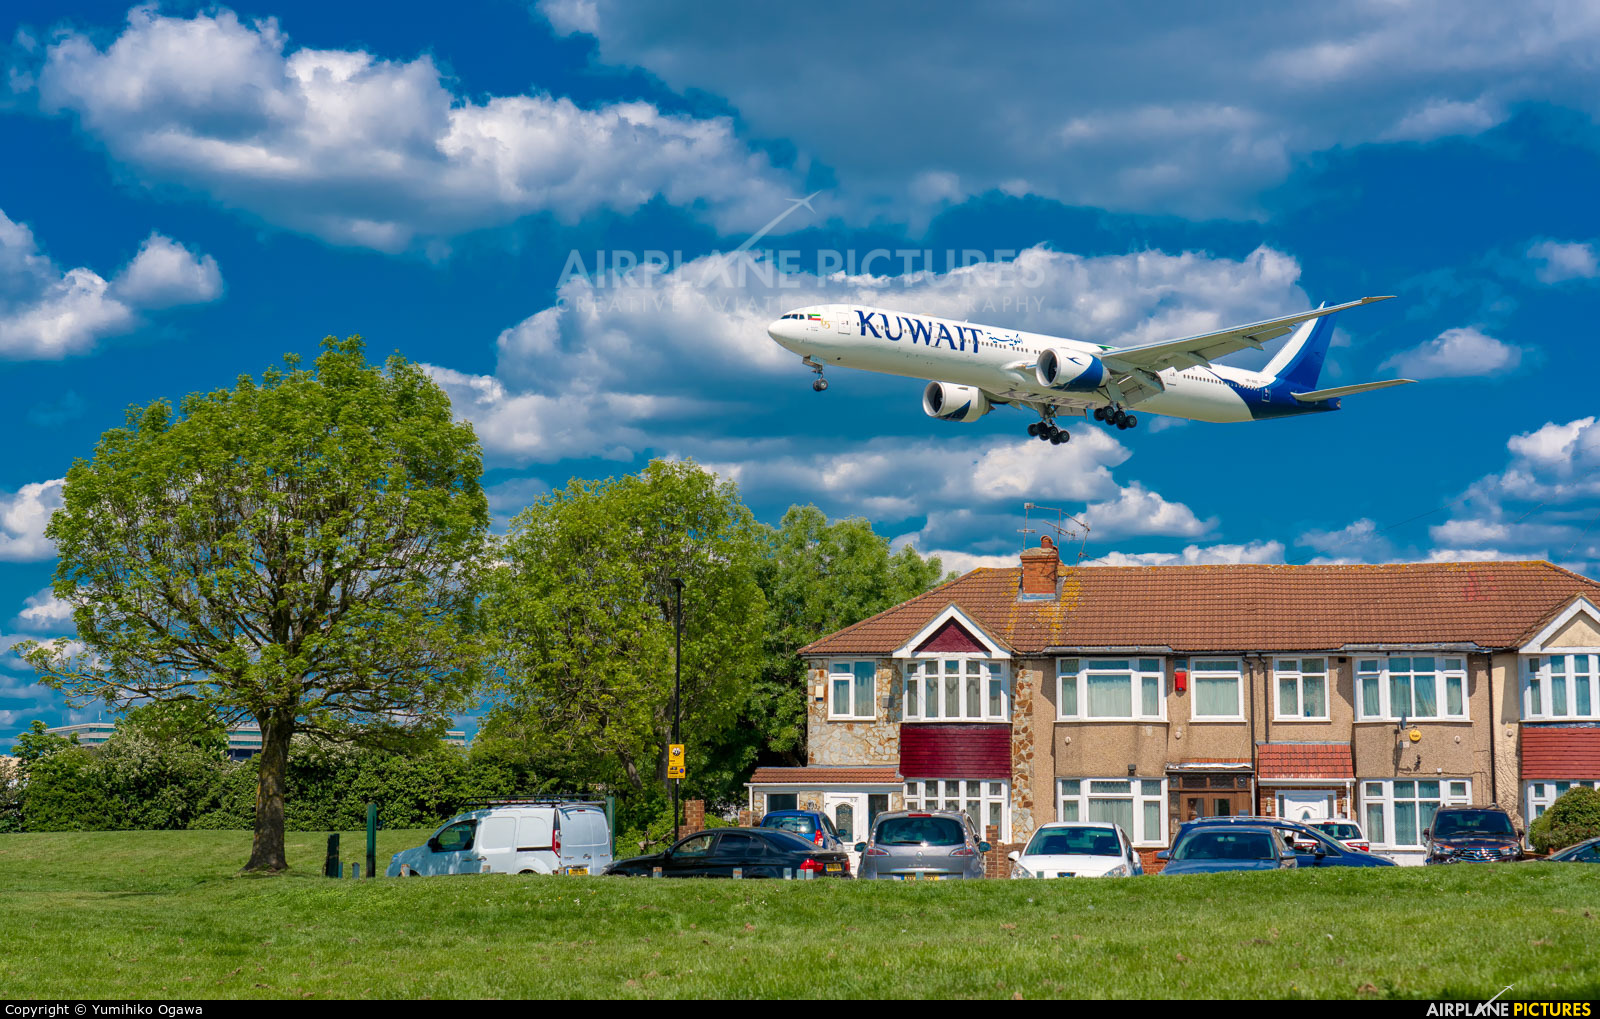 Kuwait Airways 9K-AOE aircraft at London - Heathrow